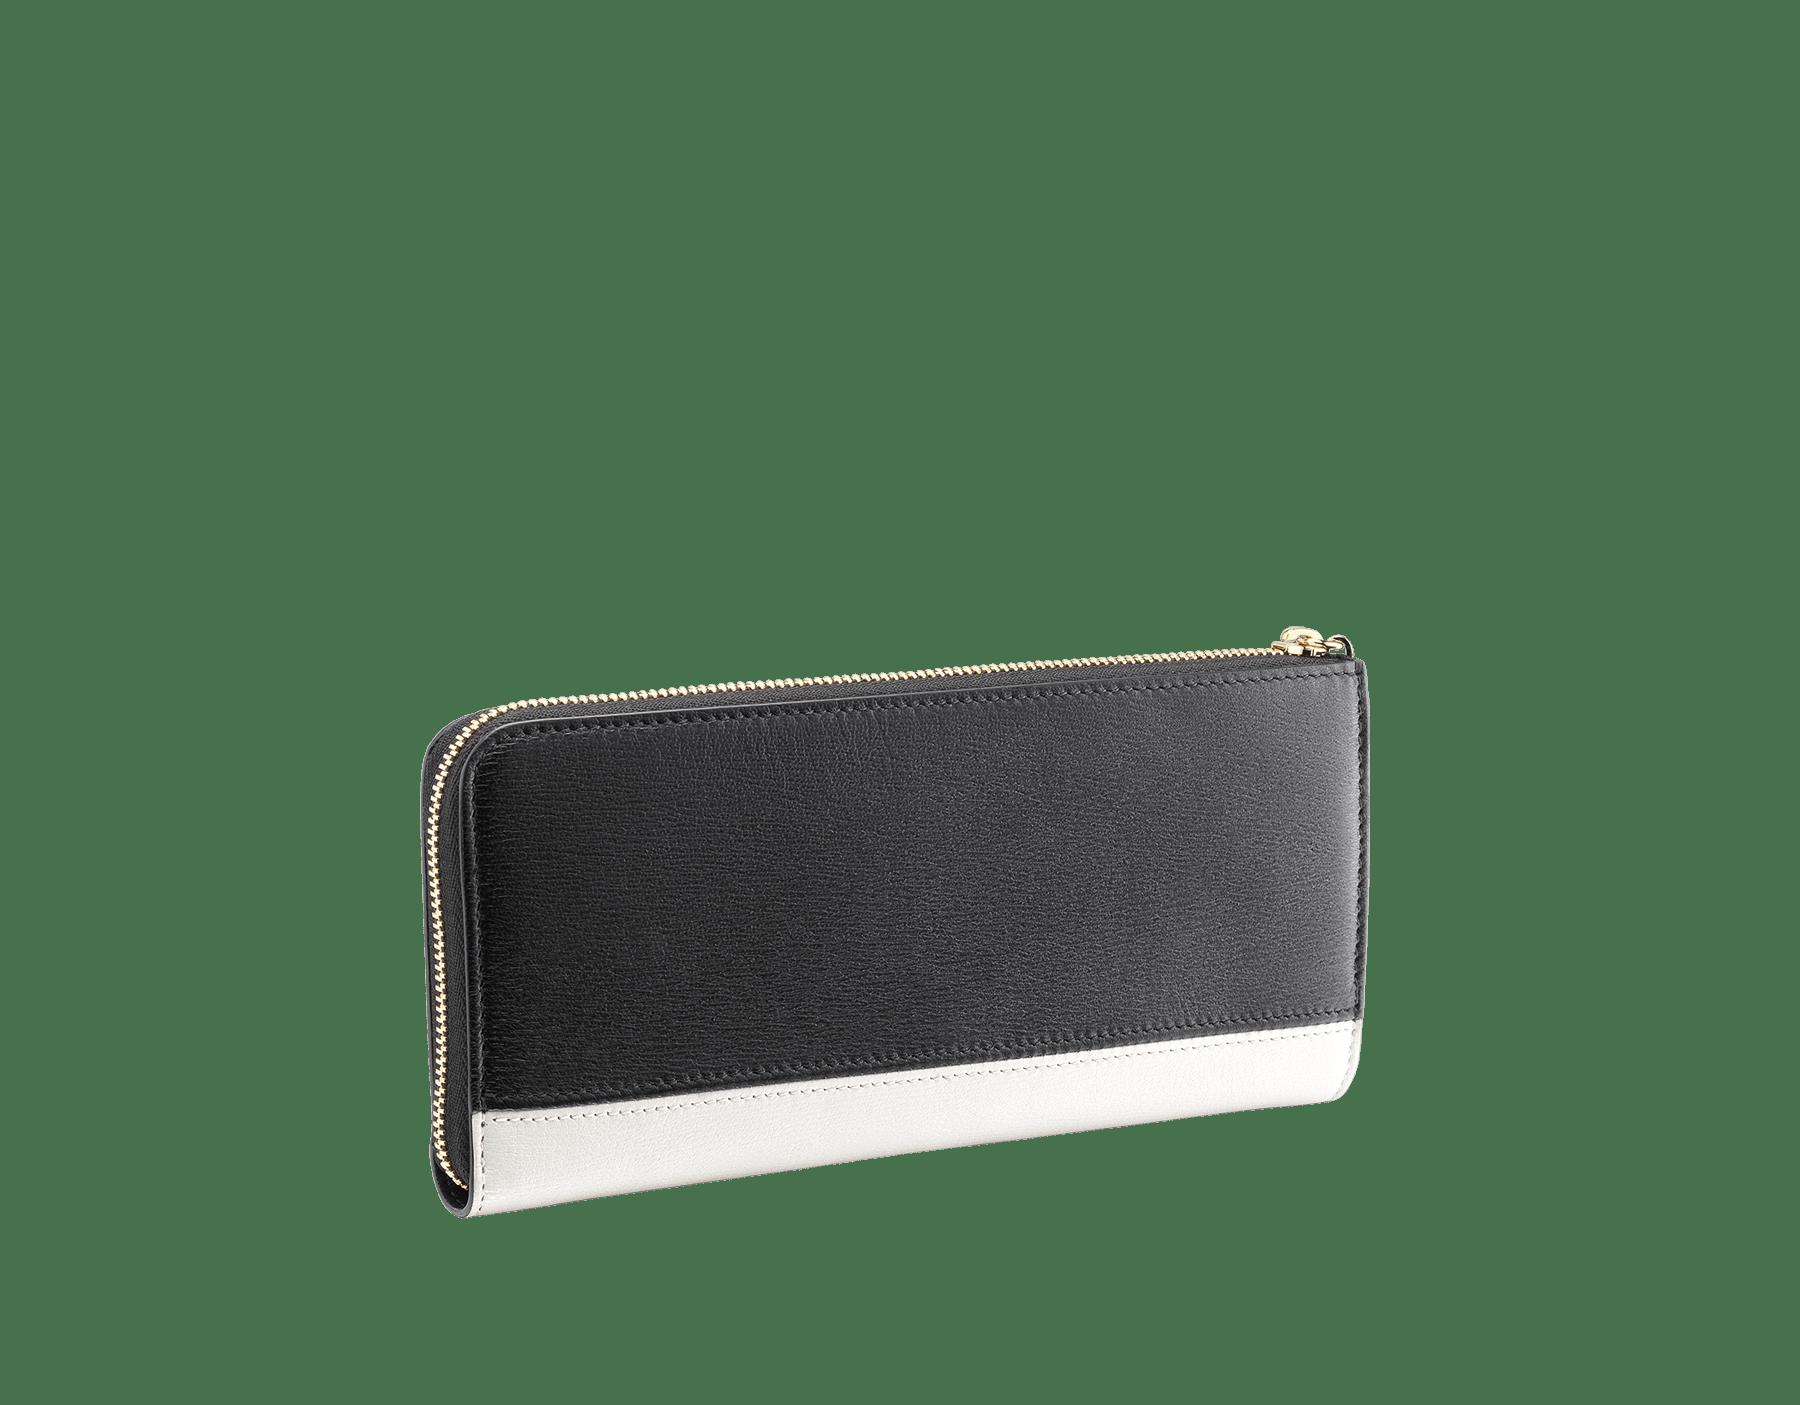 B.zero1 L-shaped zipped wallet in daisy topaz, taffy quartz goatskin and taffy quartz nappa. Iconic B.zero1 zip puller in light gold-plated brass. BZA-WLT-MZP-SLIM-L image 6